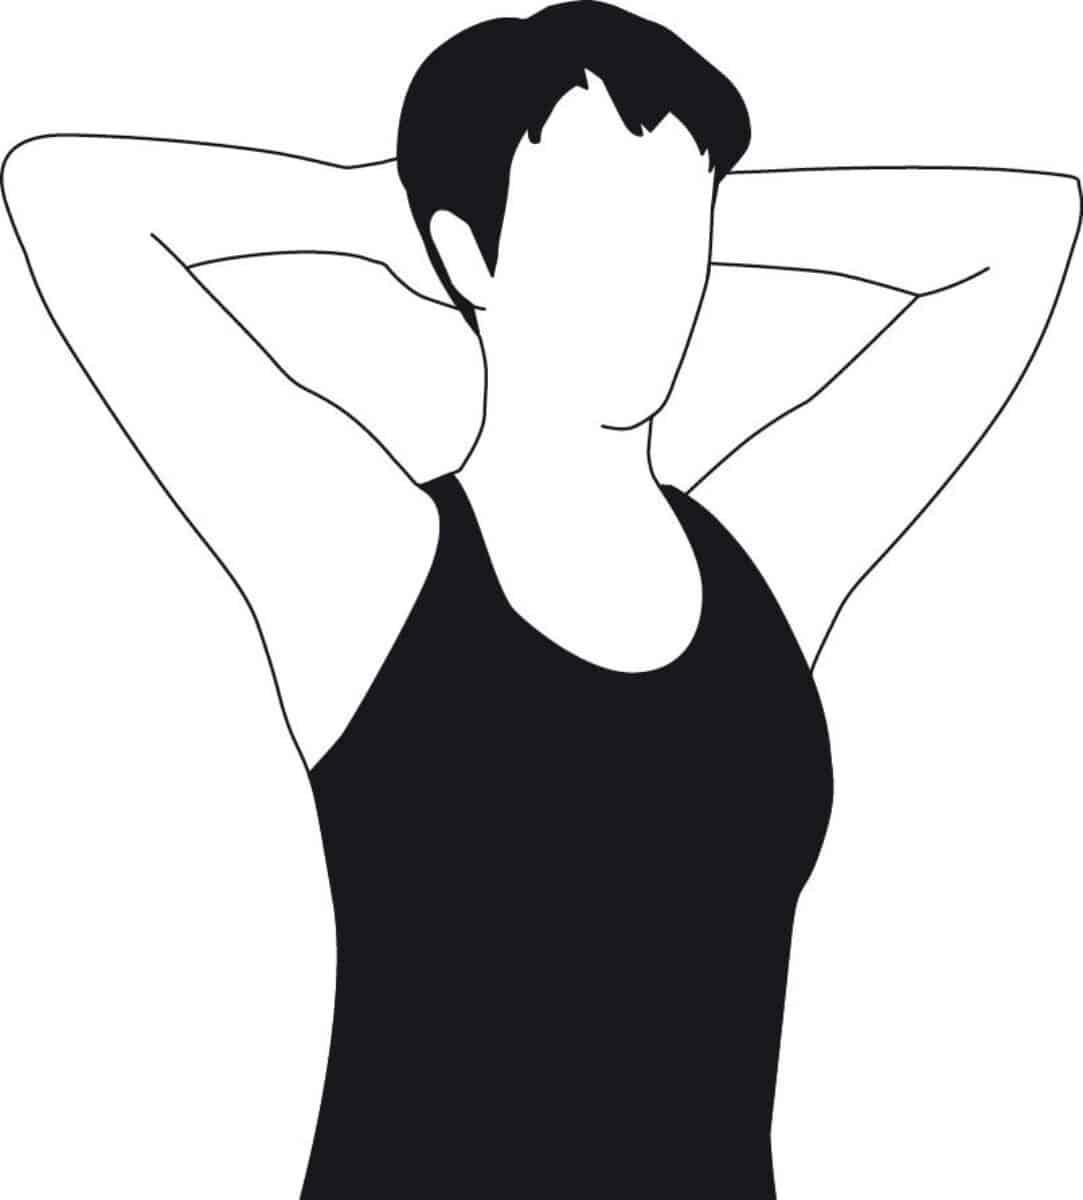 Schulter-Übung 2 - Ausgangsposition